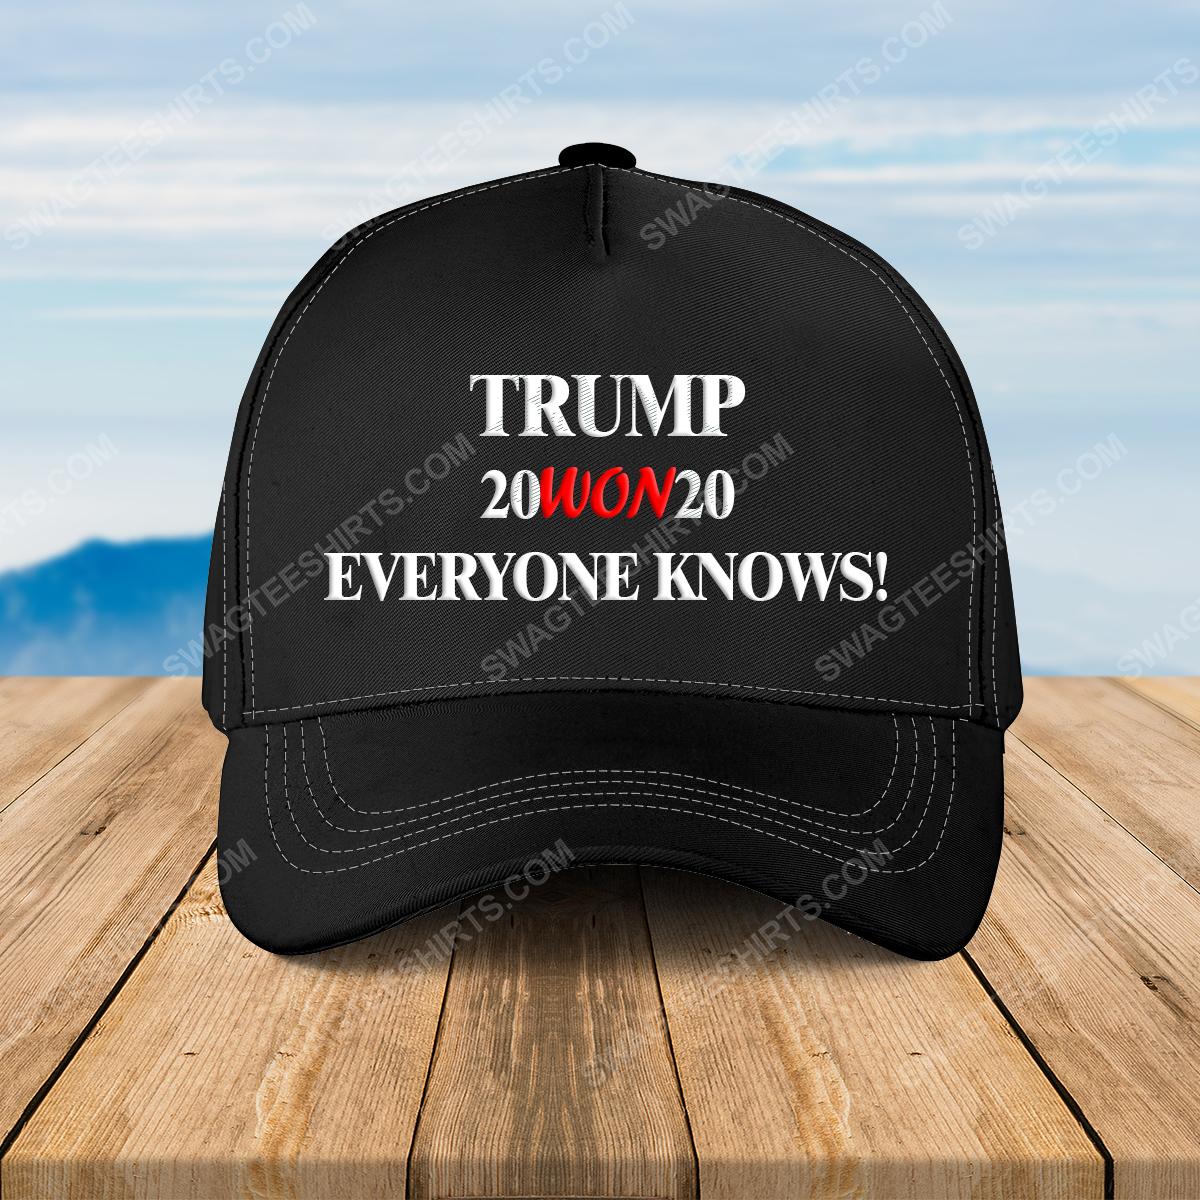 Trump 20won20 everyone american flag full print classic hat